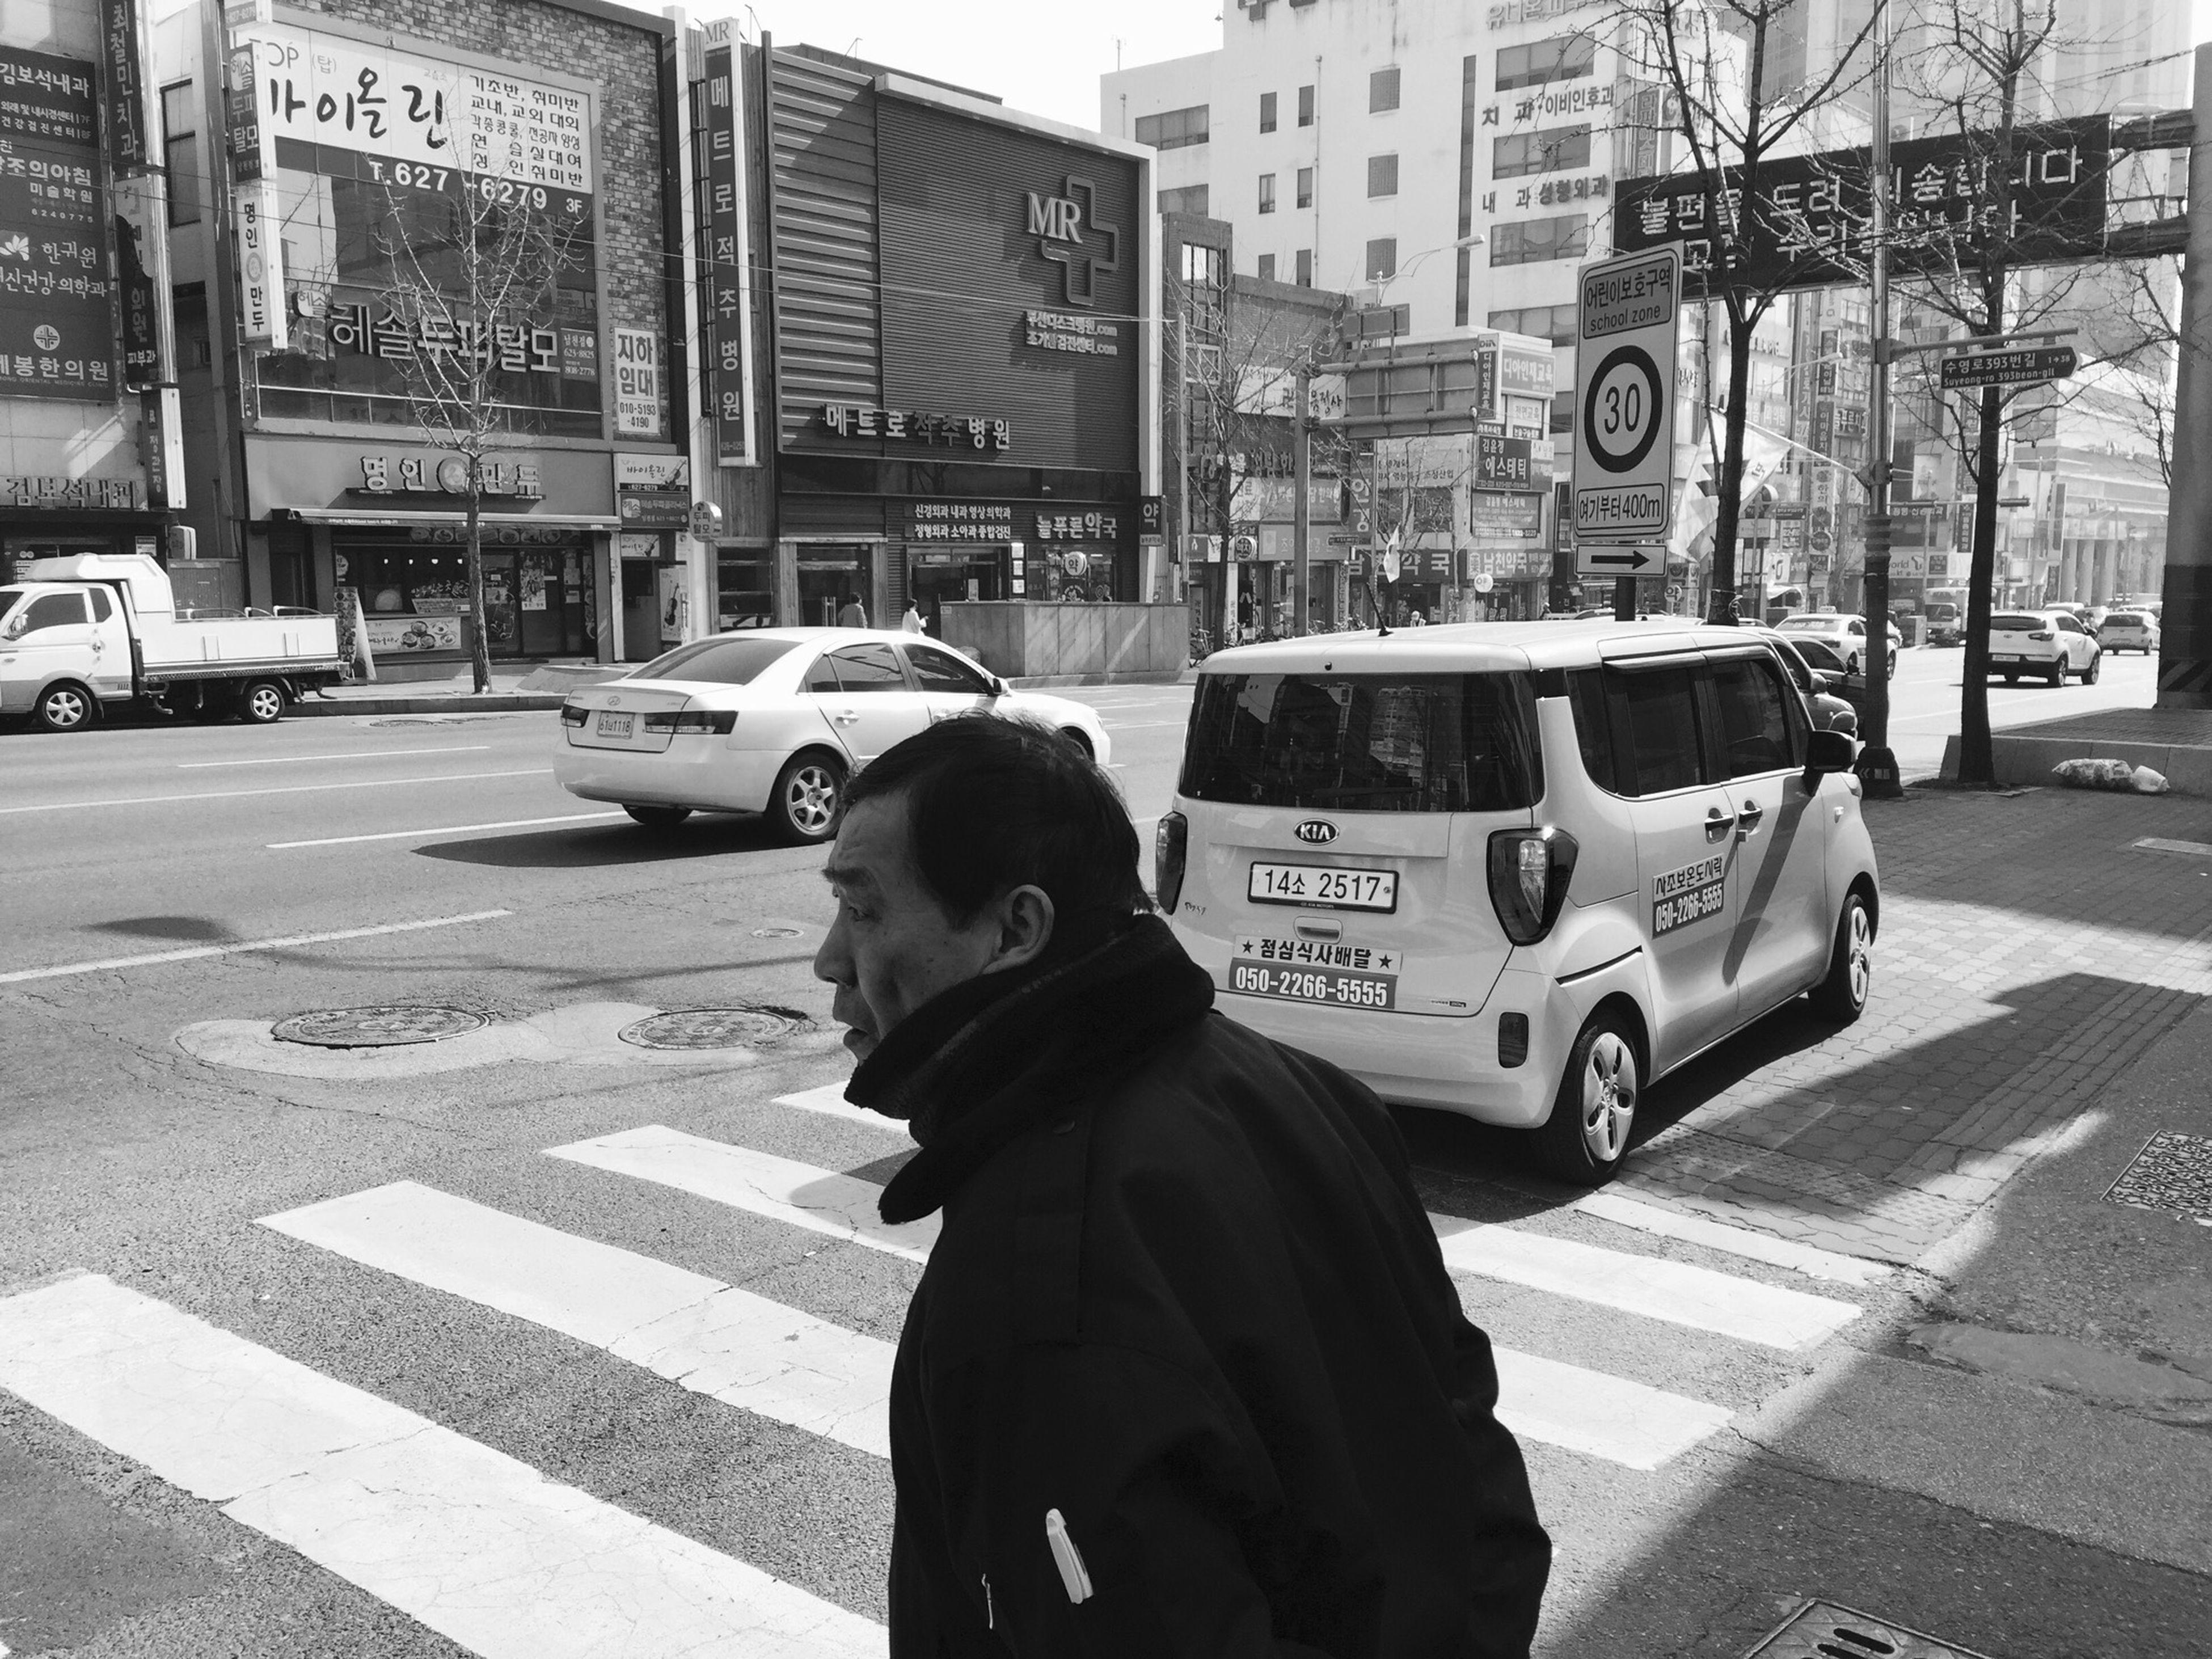 2015.03.17.(TueLftMJ189) On The Road Blackandwhite Monochrome Streetphotography